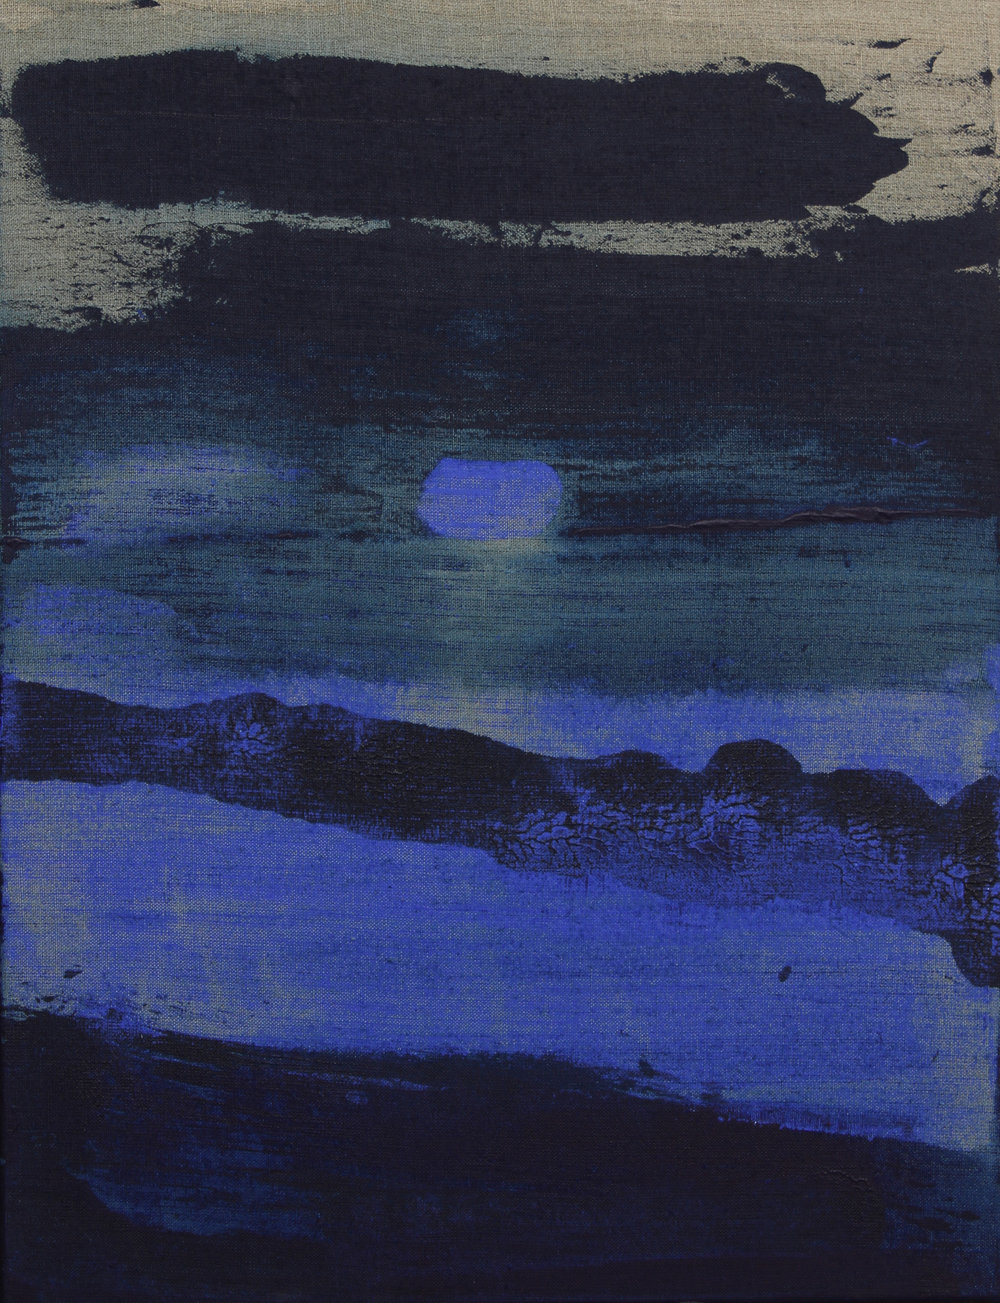 Painting 65/50 cm - Acrylic on canvas